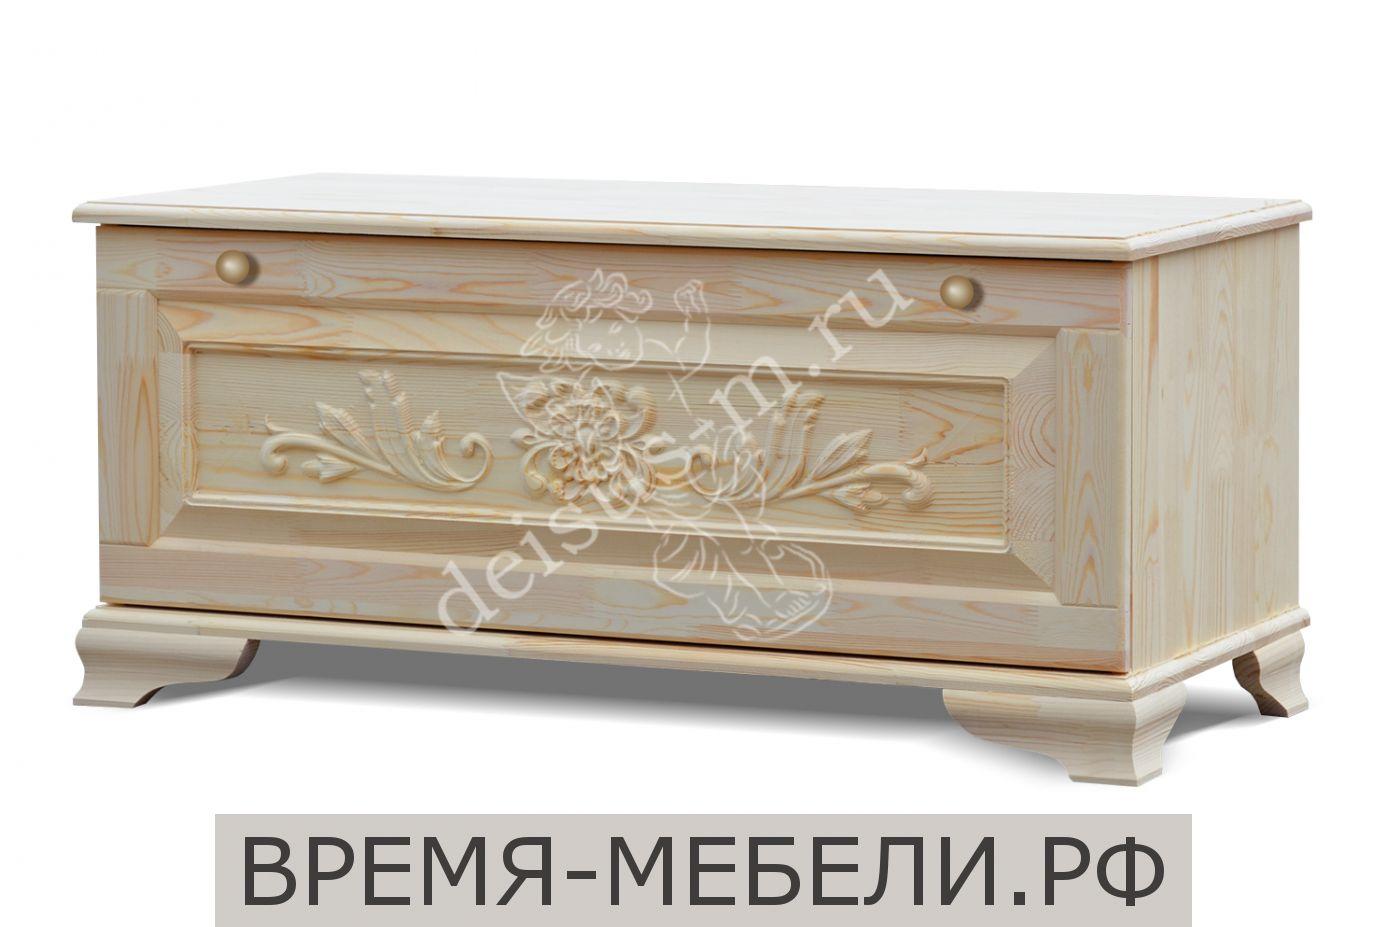 Сундук Валентин-М